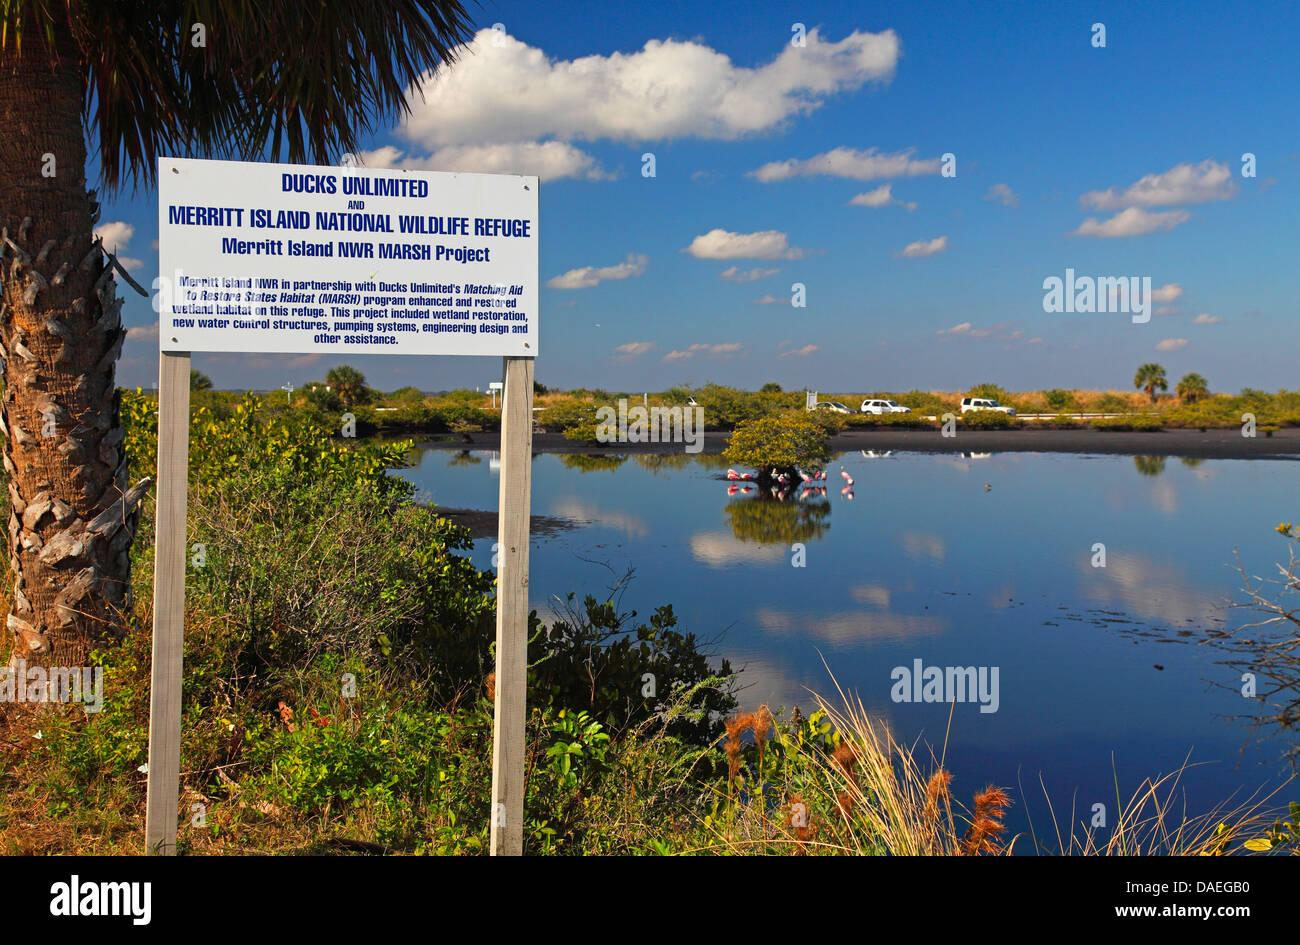 National wildlife refuge Merritt Island, information plate, USA, Florida, Merritt Island Stock Photo